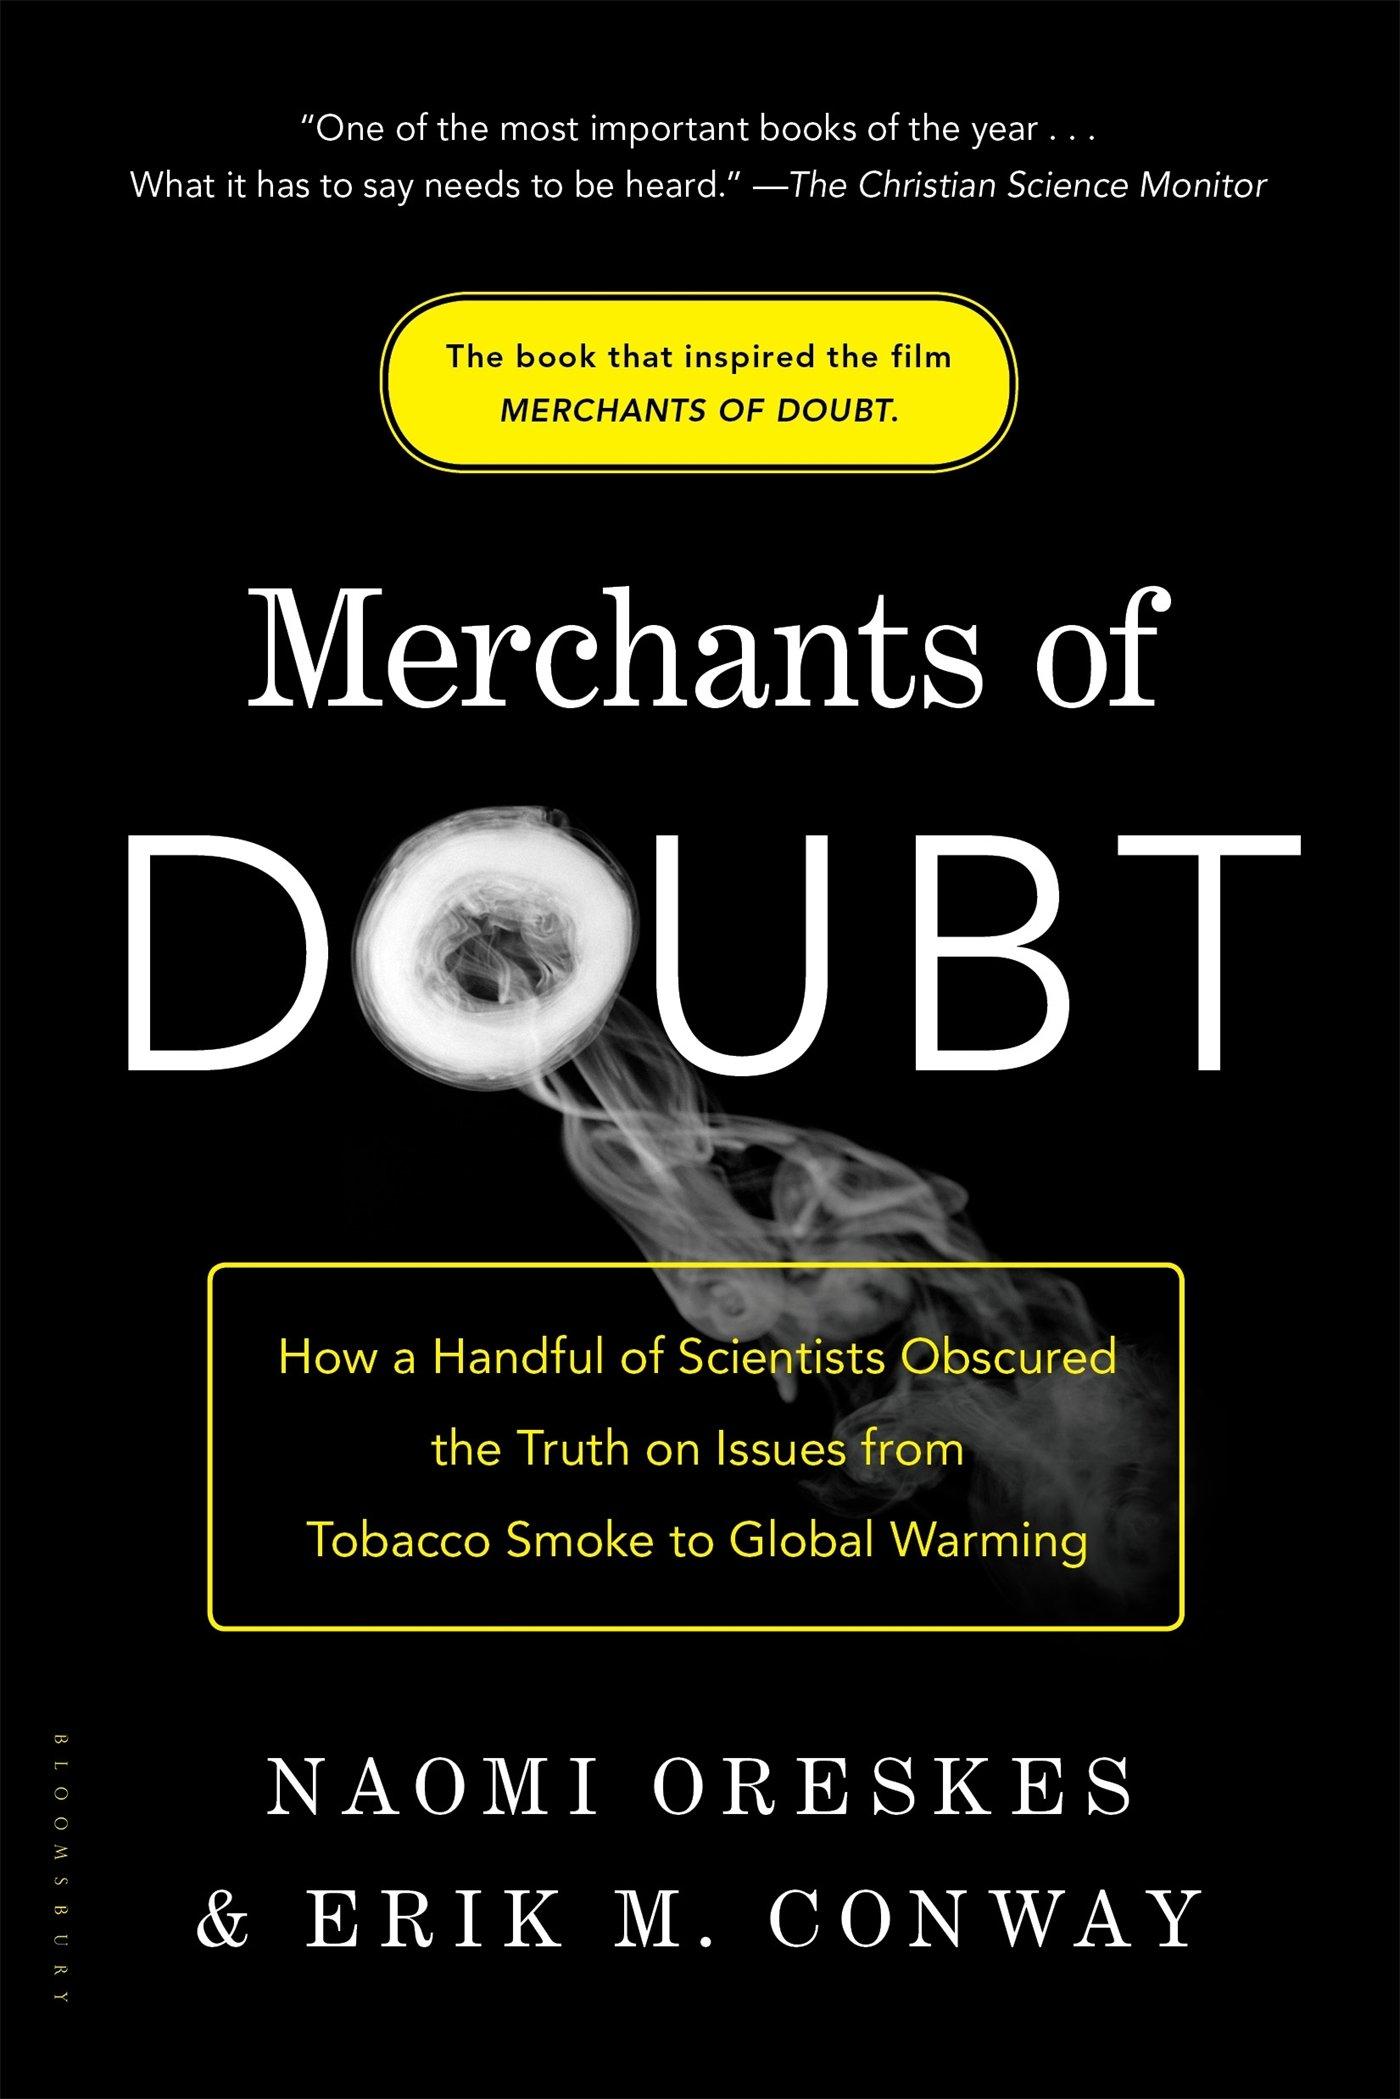 Merchants of death thesis